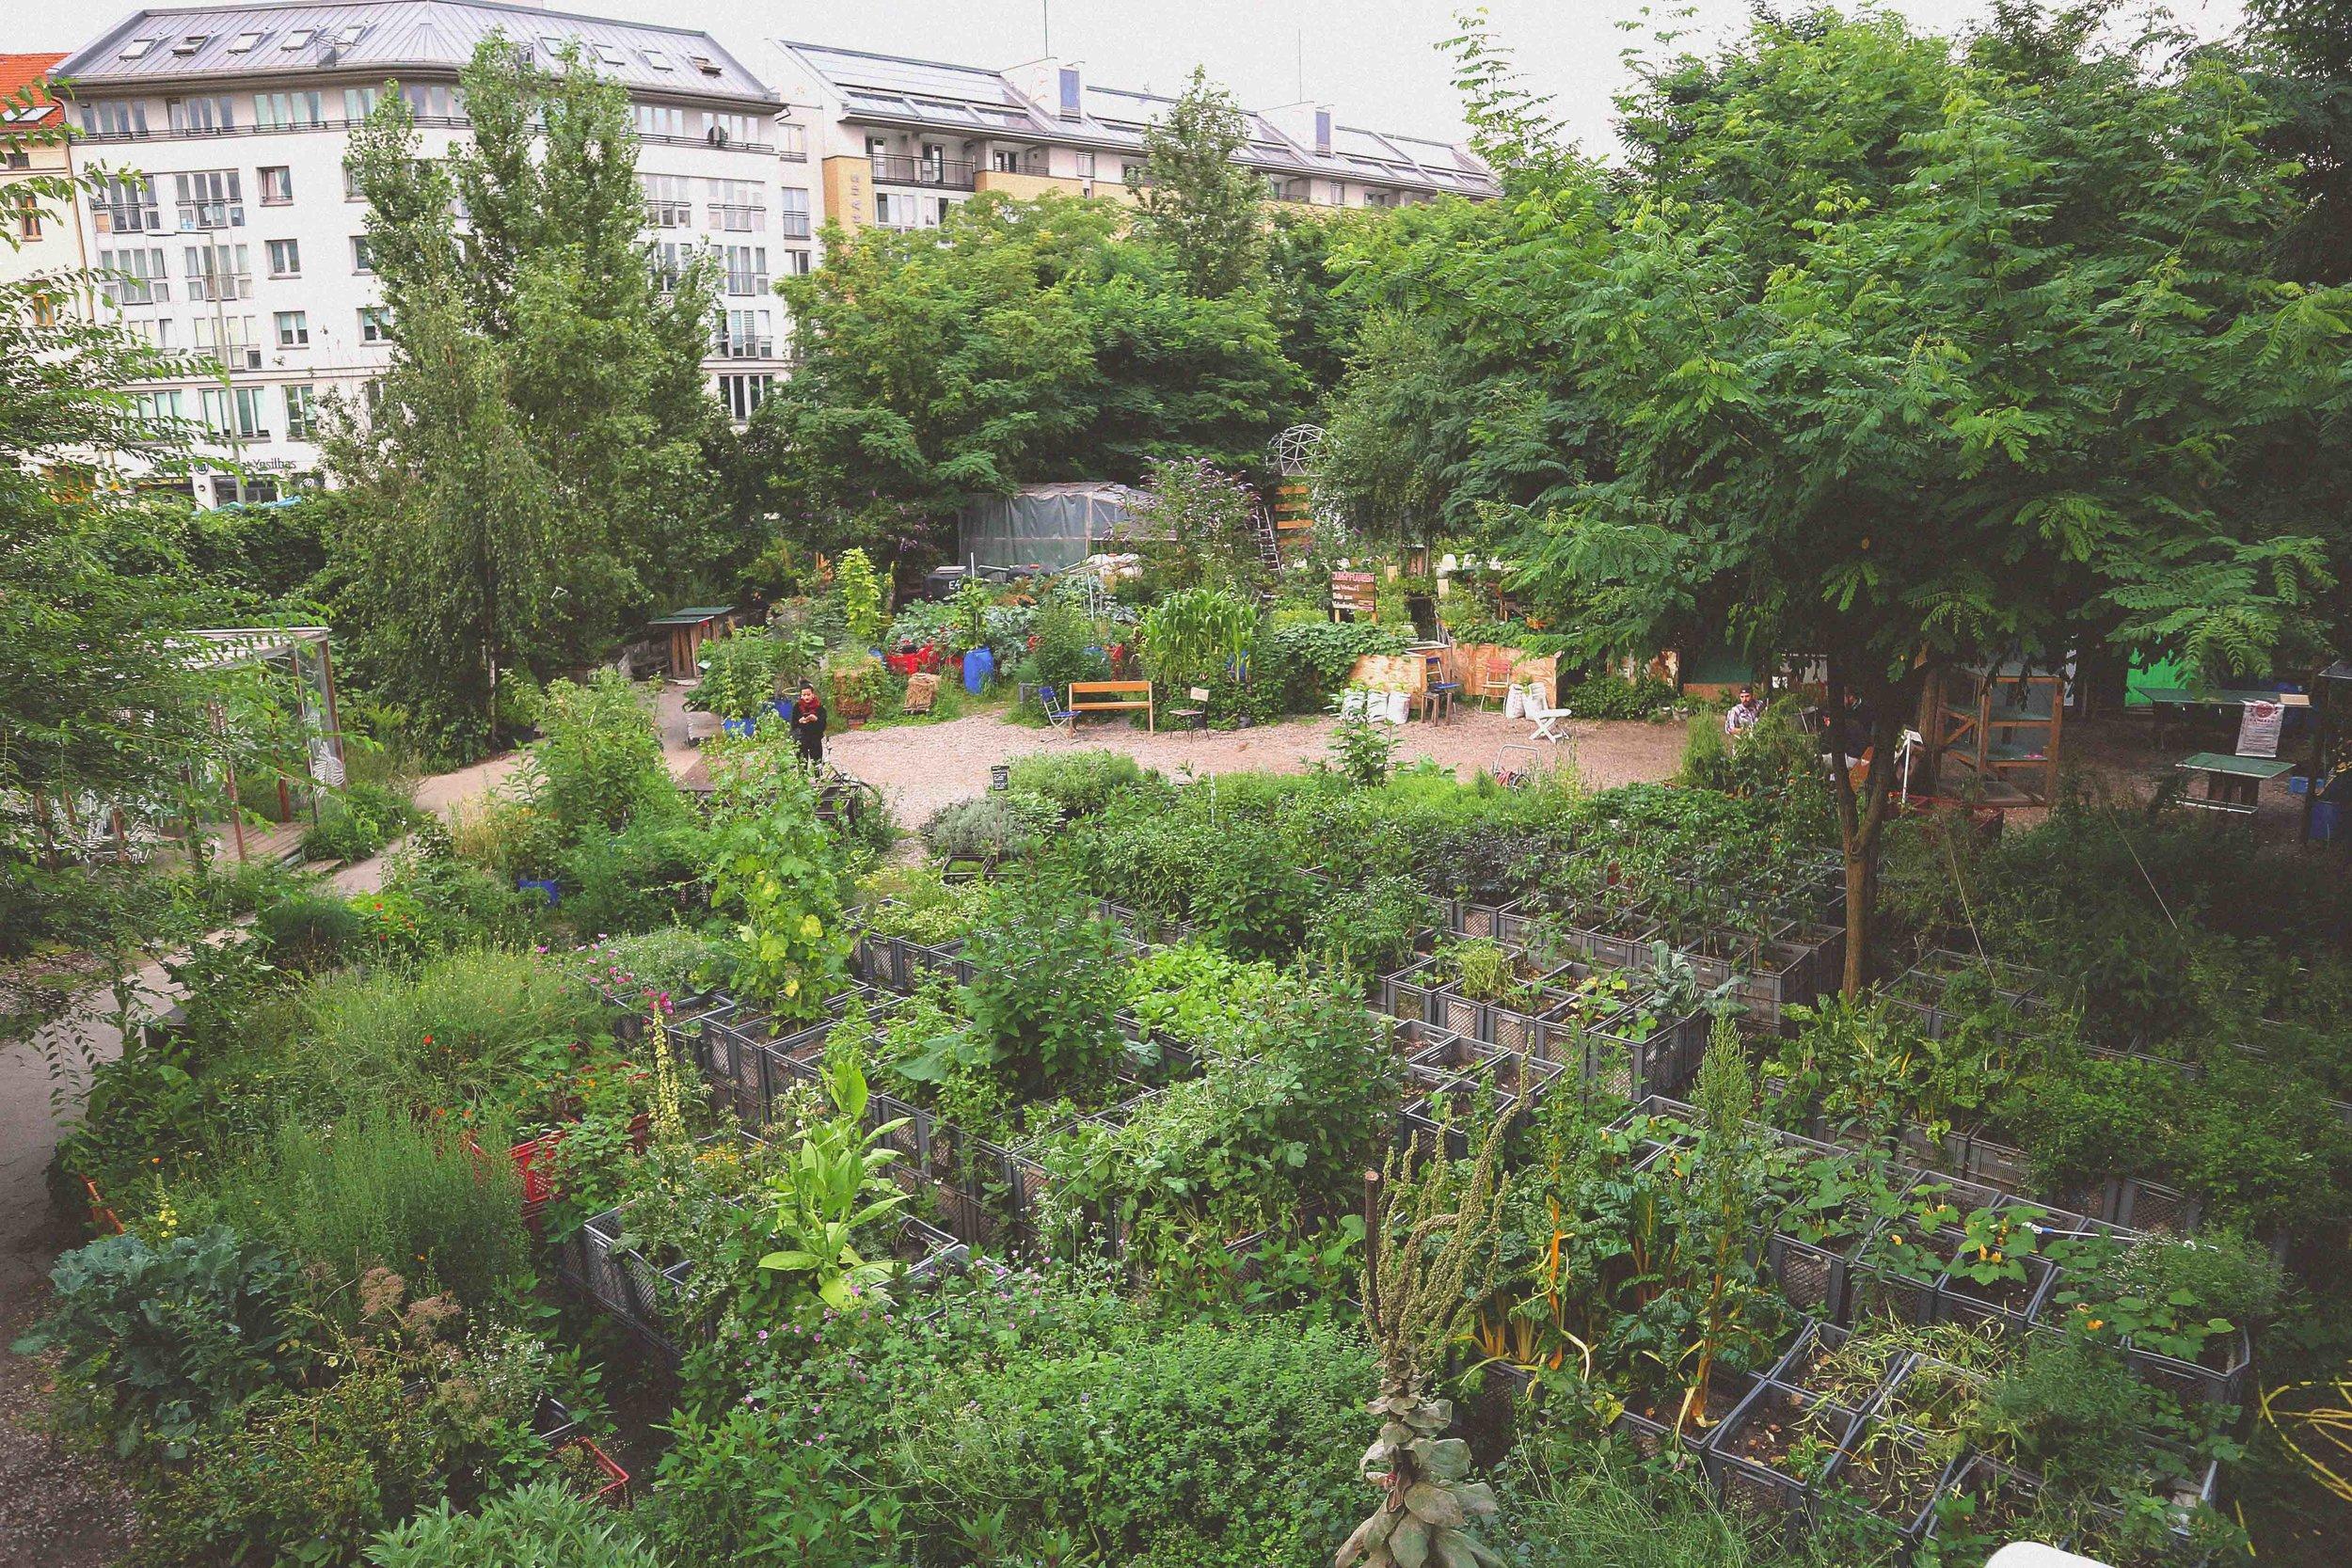 The Prinzess Innen Garten